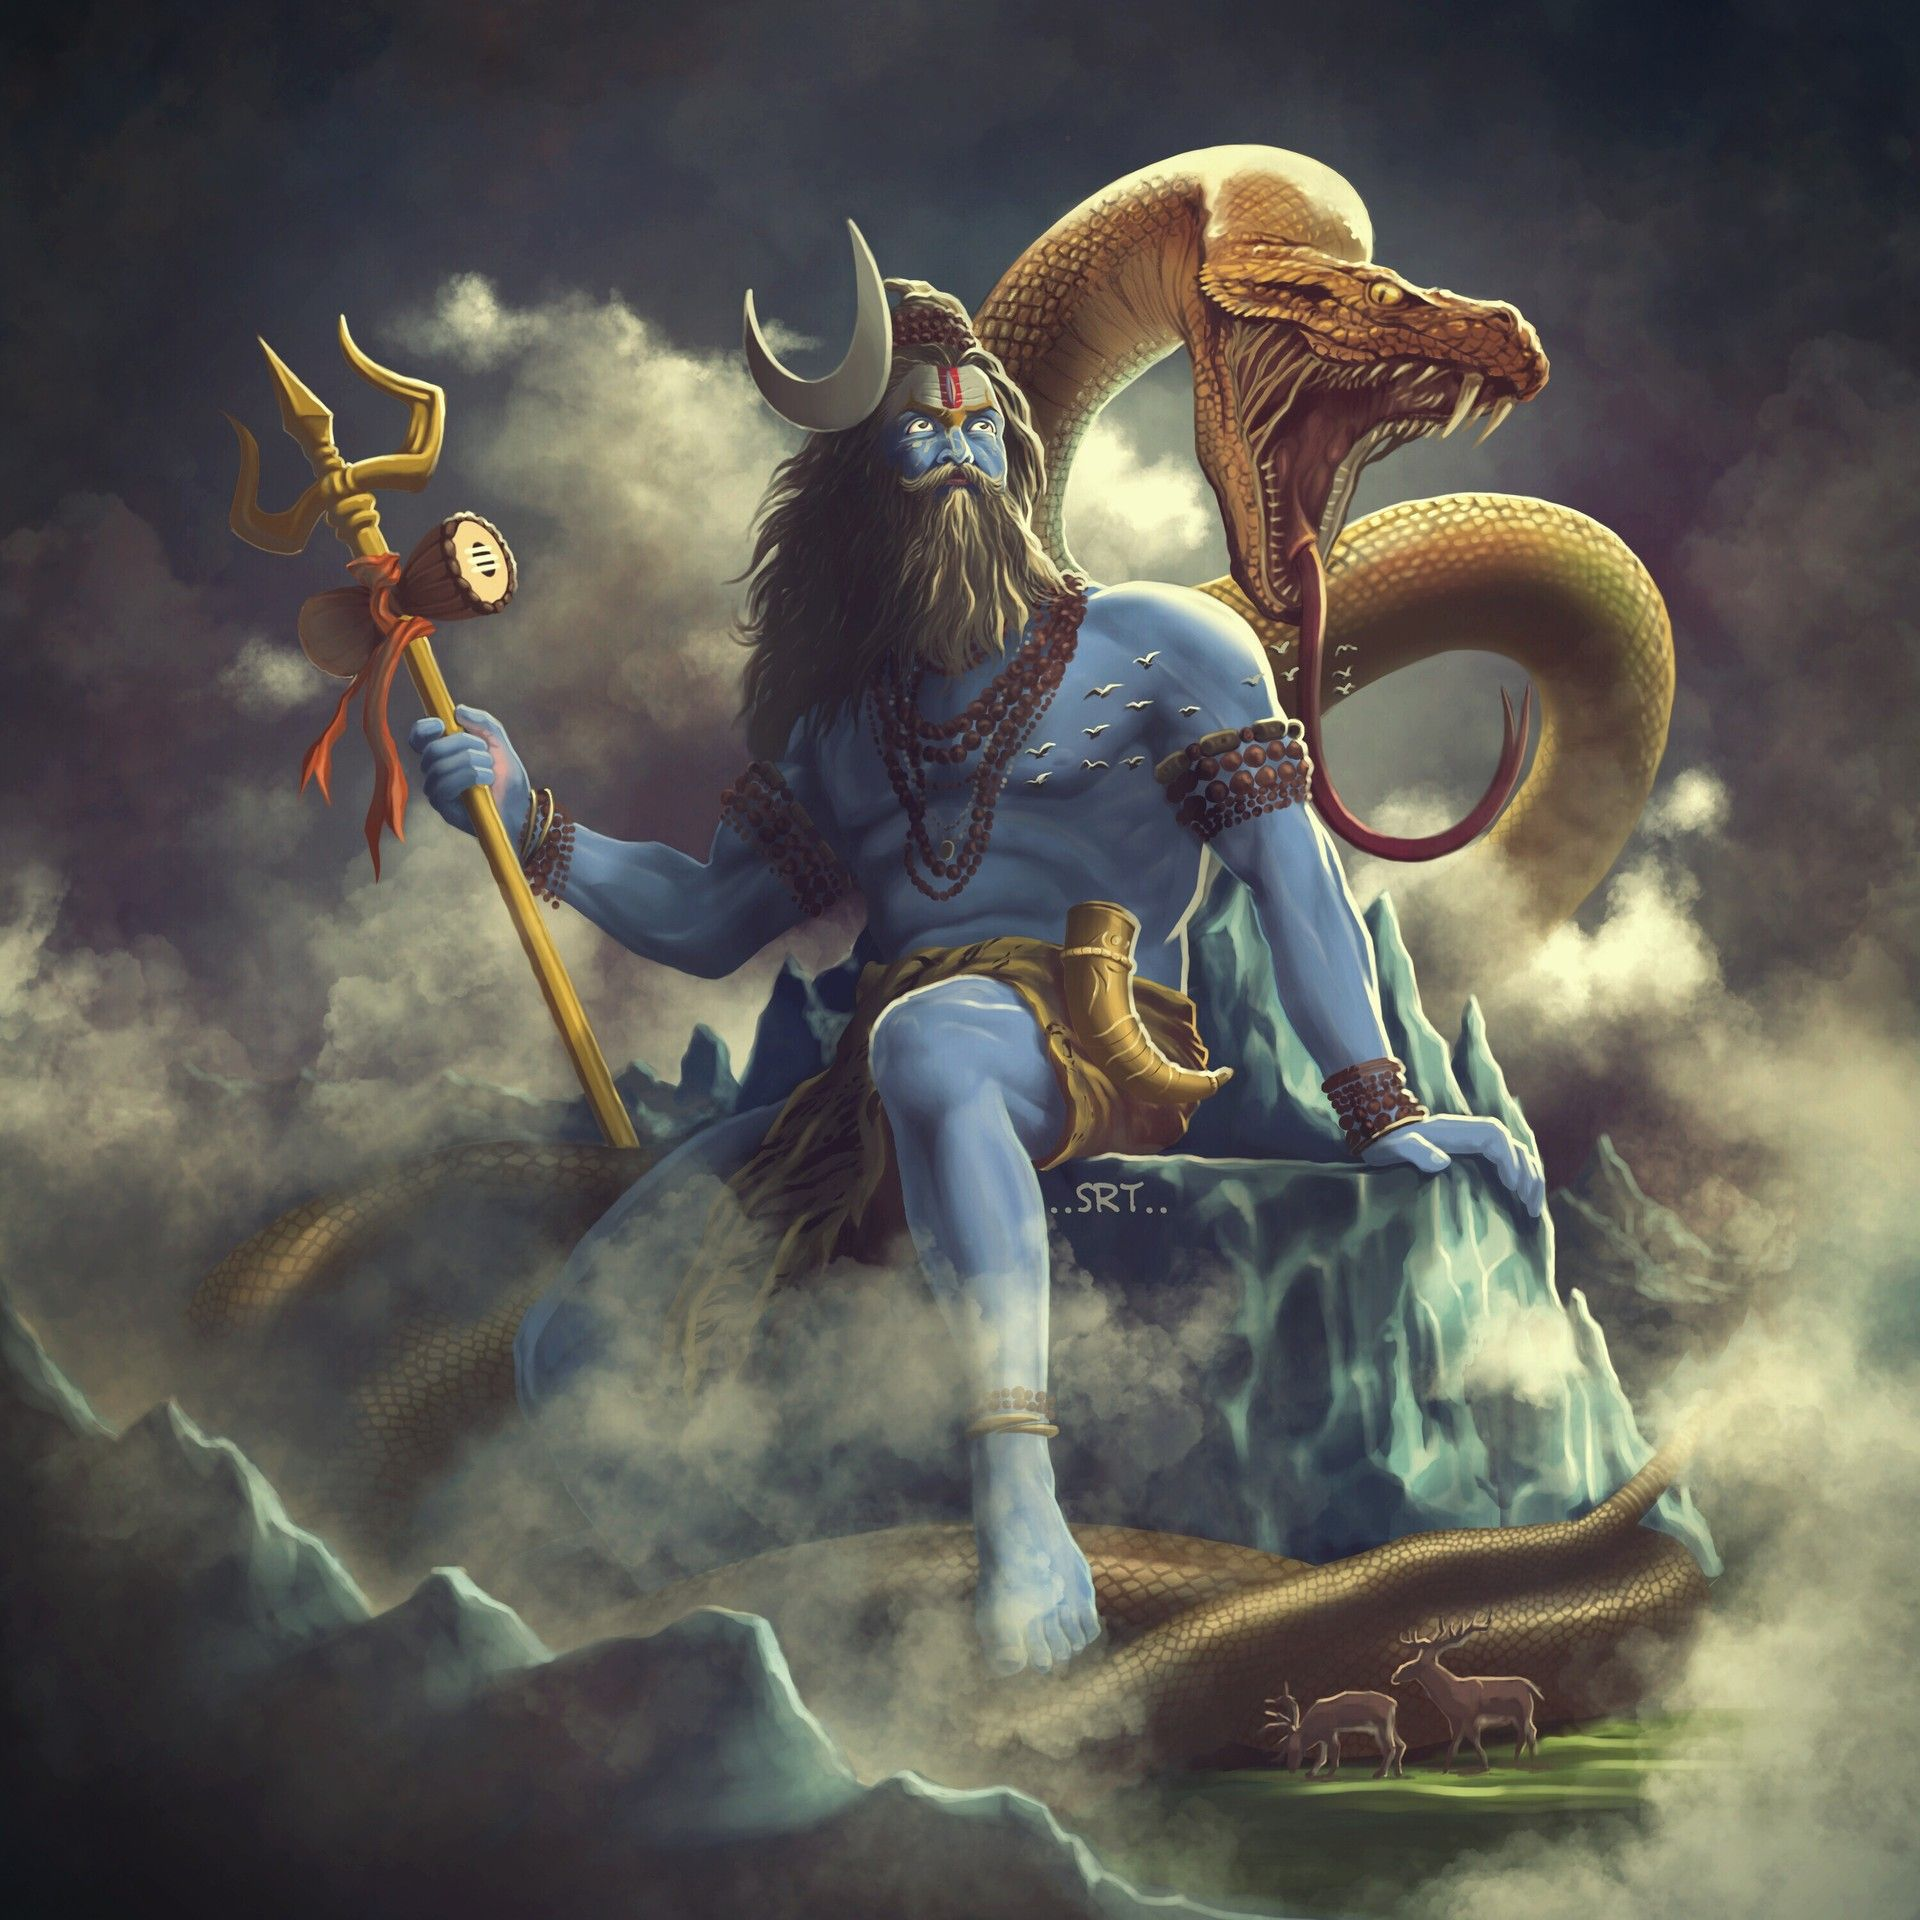 Artstation Aghori Shiva Sarath Babu Lord Shiva Shiva Lord